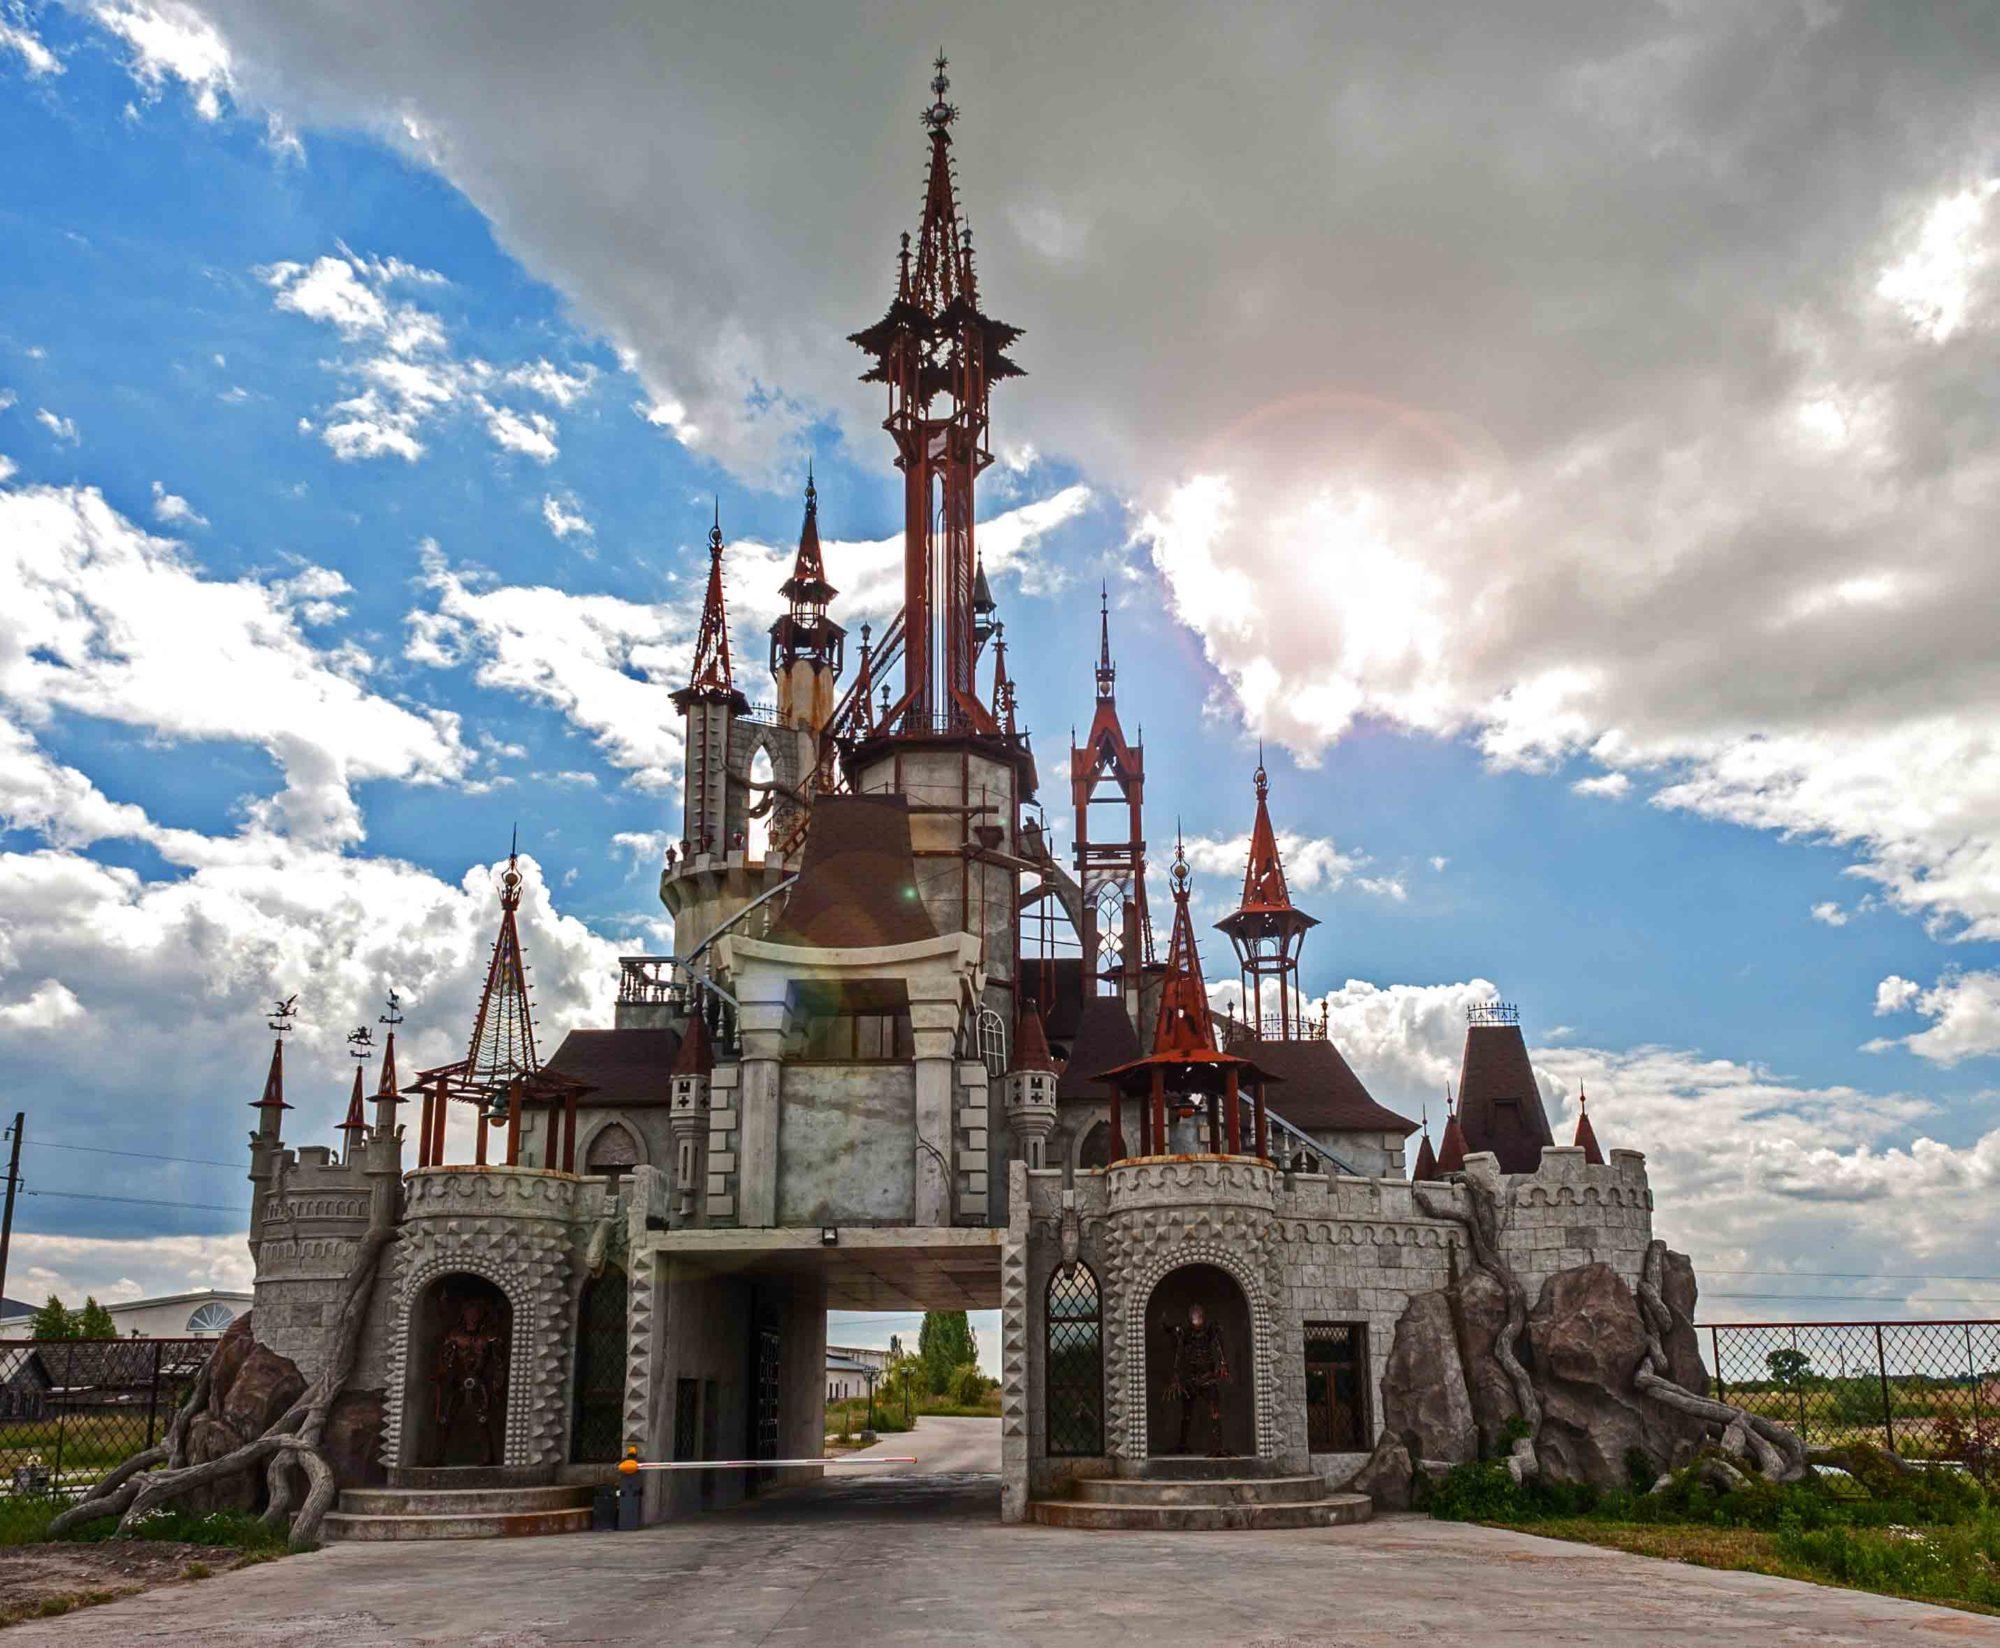 Казковий замок на Київщині -  - d3c6a4 2403909a8586451da5415d3e1e430562 2000x1648